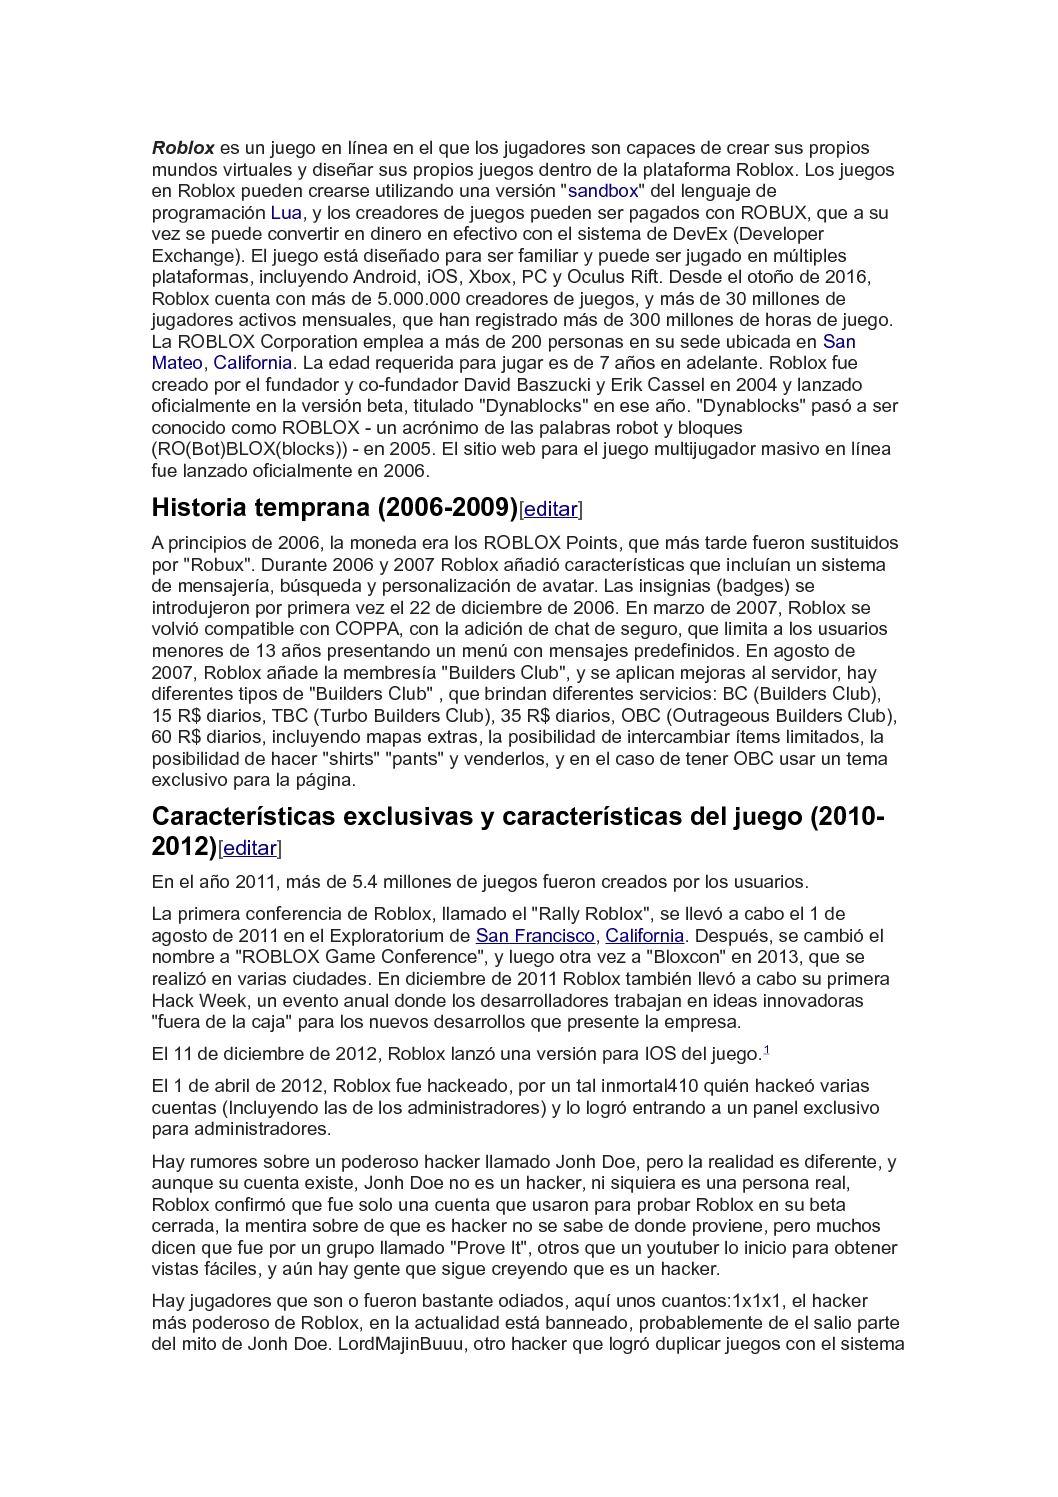 Calaméo Roblox - dynablocksbeta a 2005 roblox